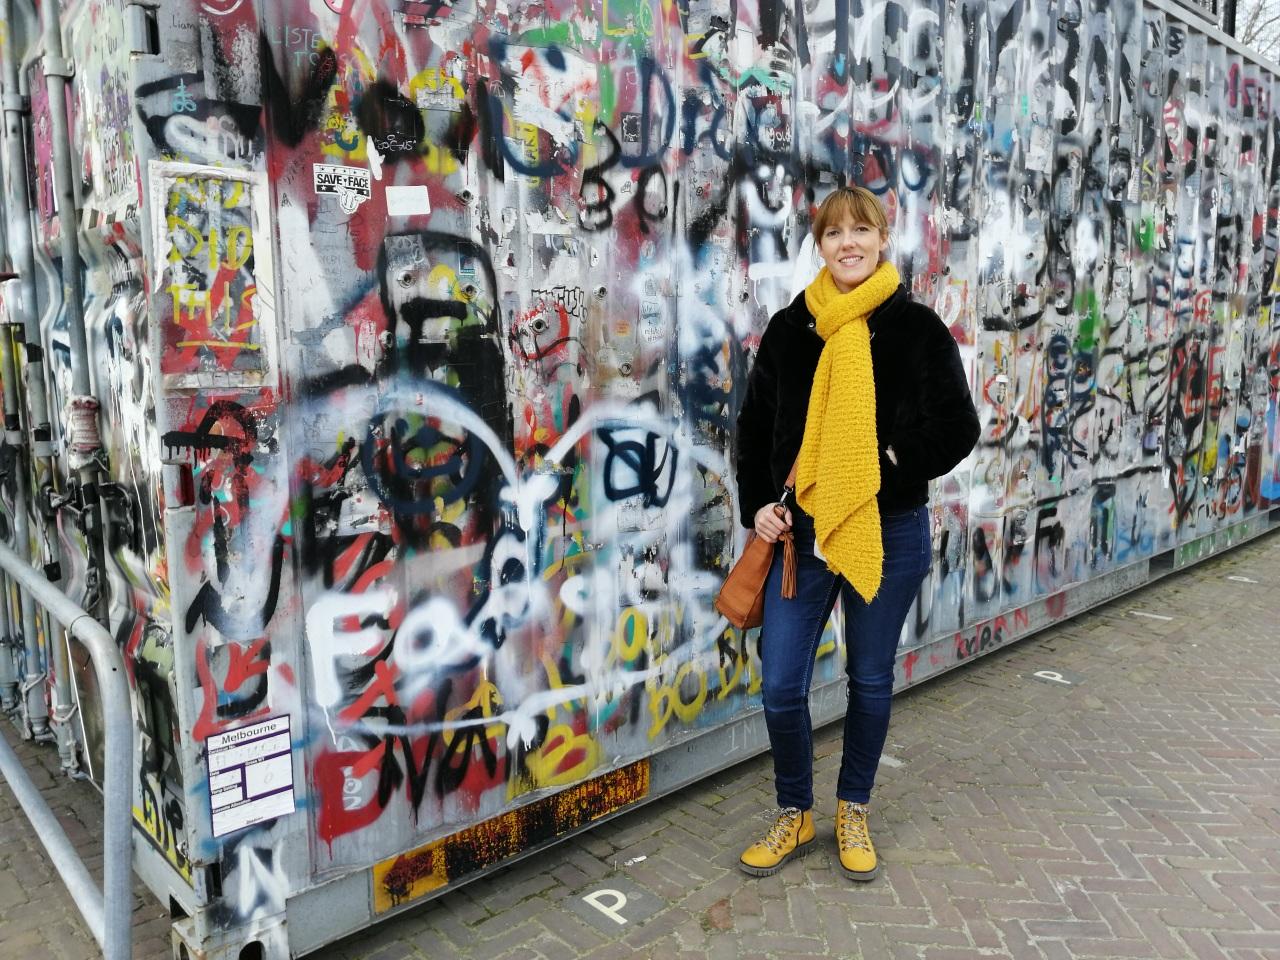 Stadswandeling Eindhoven